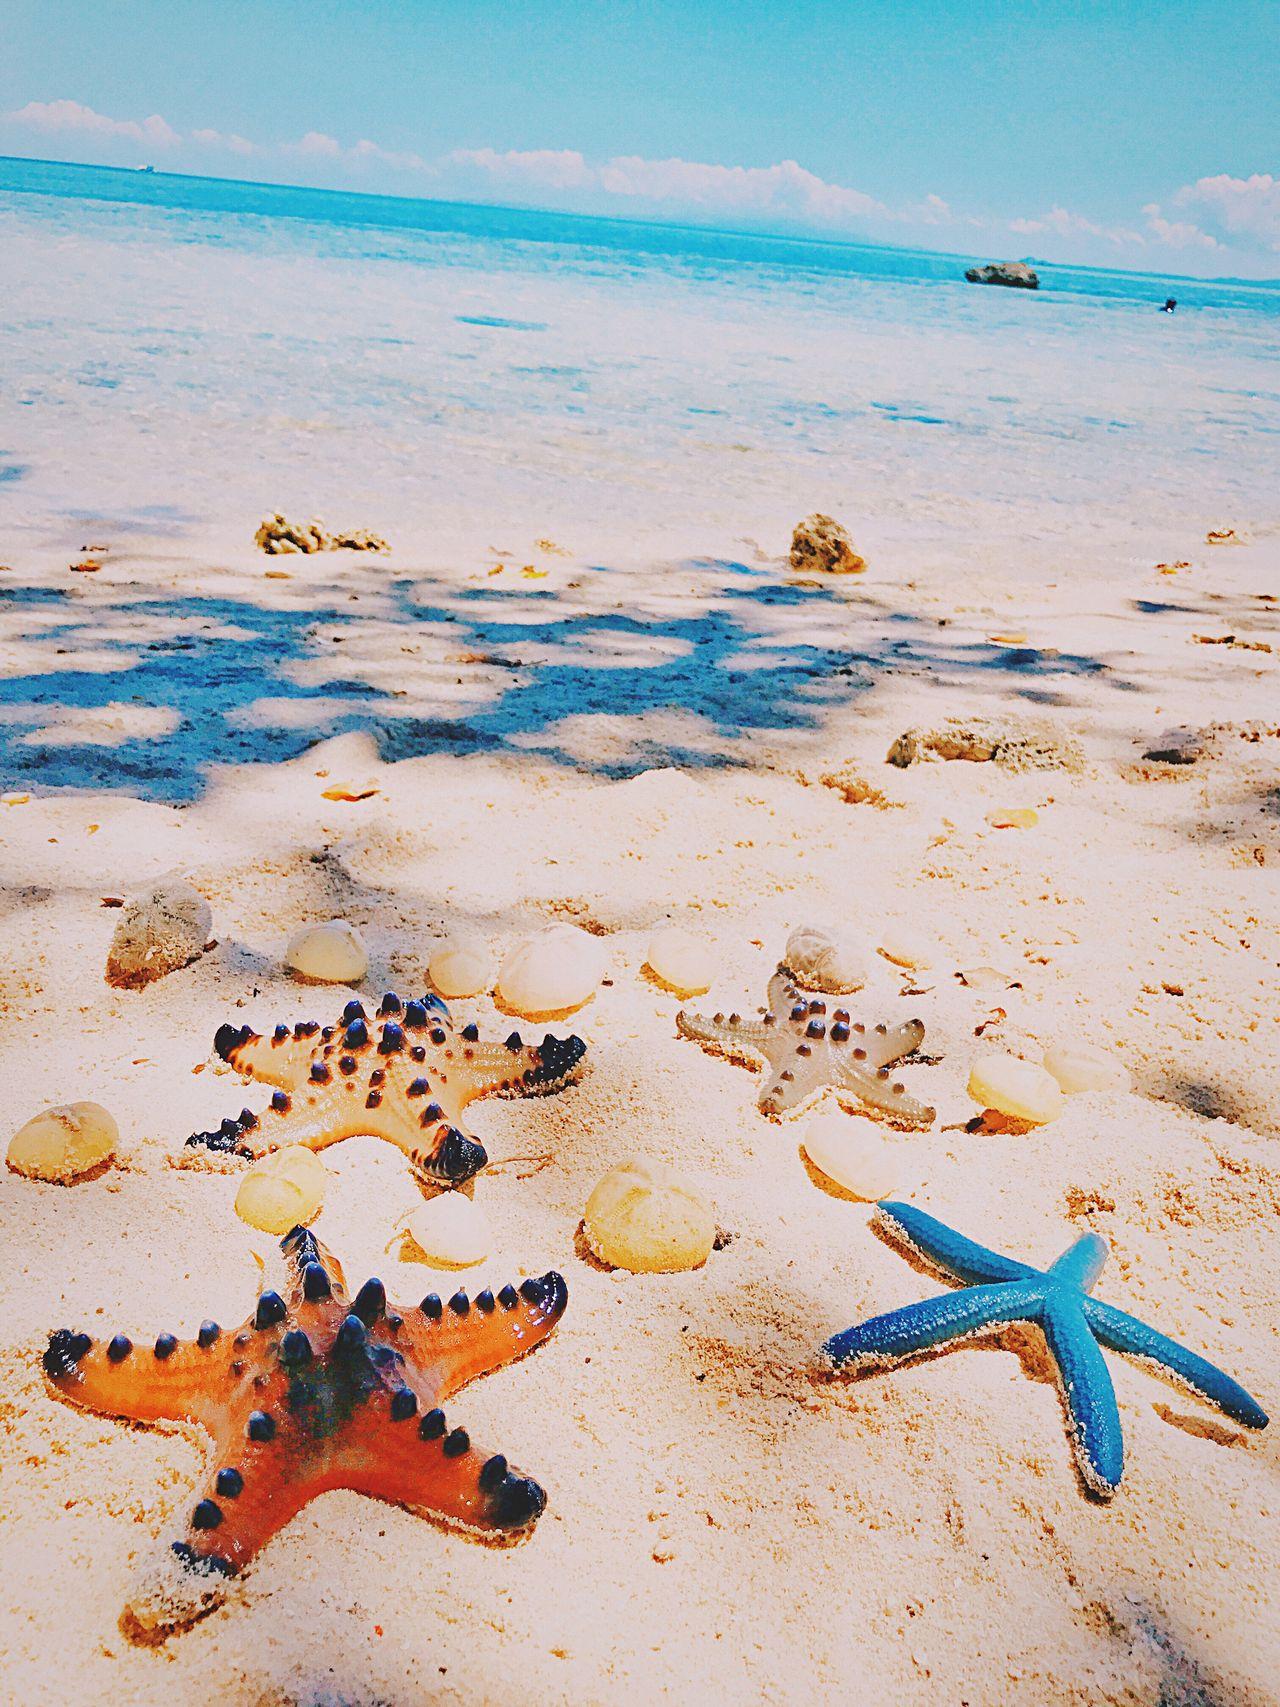 Art Is Everywhere Seascape Photography Starfish  Starfish At Beach Beach Sand Sea Shore Nature Water Scenics Sky Sea Life Eyem Best Shots Eyemnaturelover Summertime Paradise Seascape Horizon Over Water